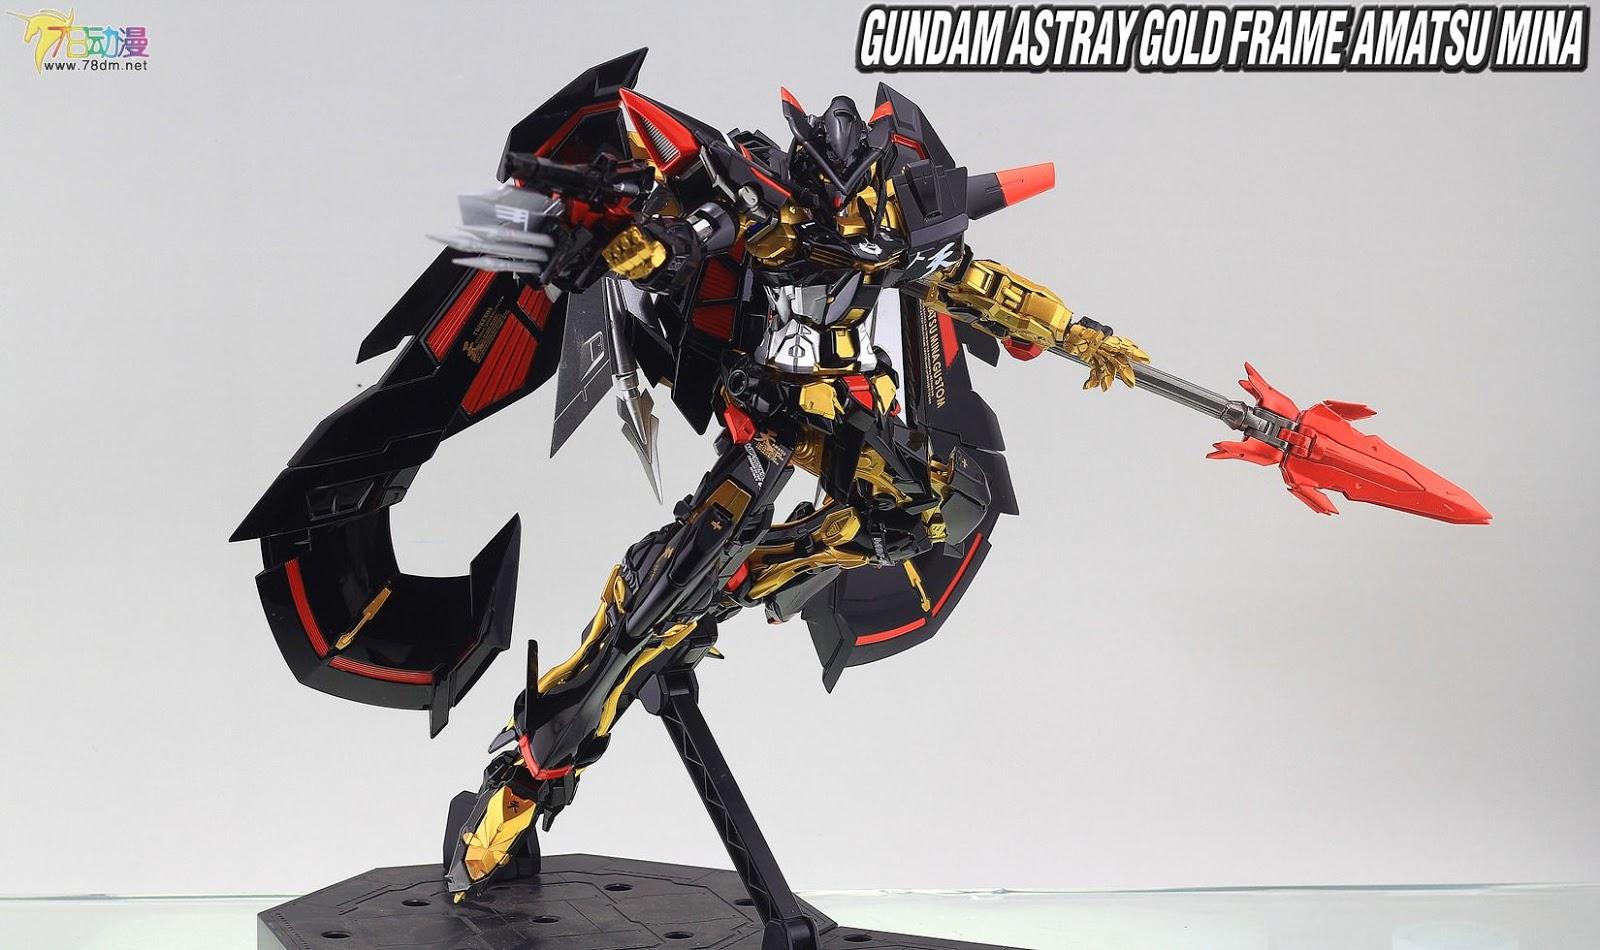 Bandai Tamashii Gundam FF Metal Composite Unicorn 03 Phenex Action Figure 22 cm